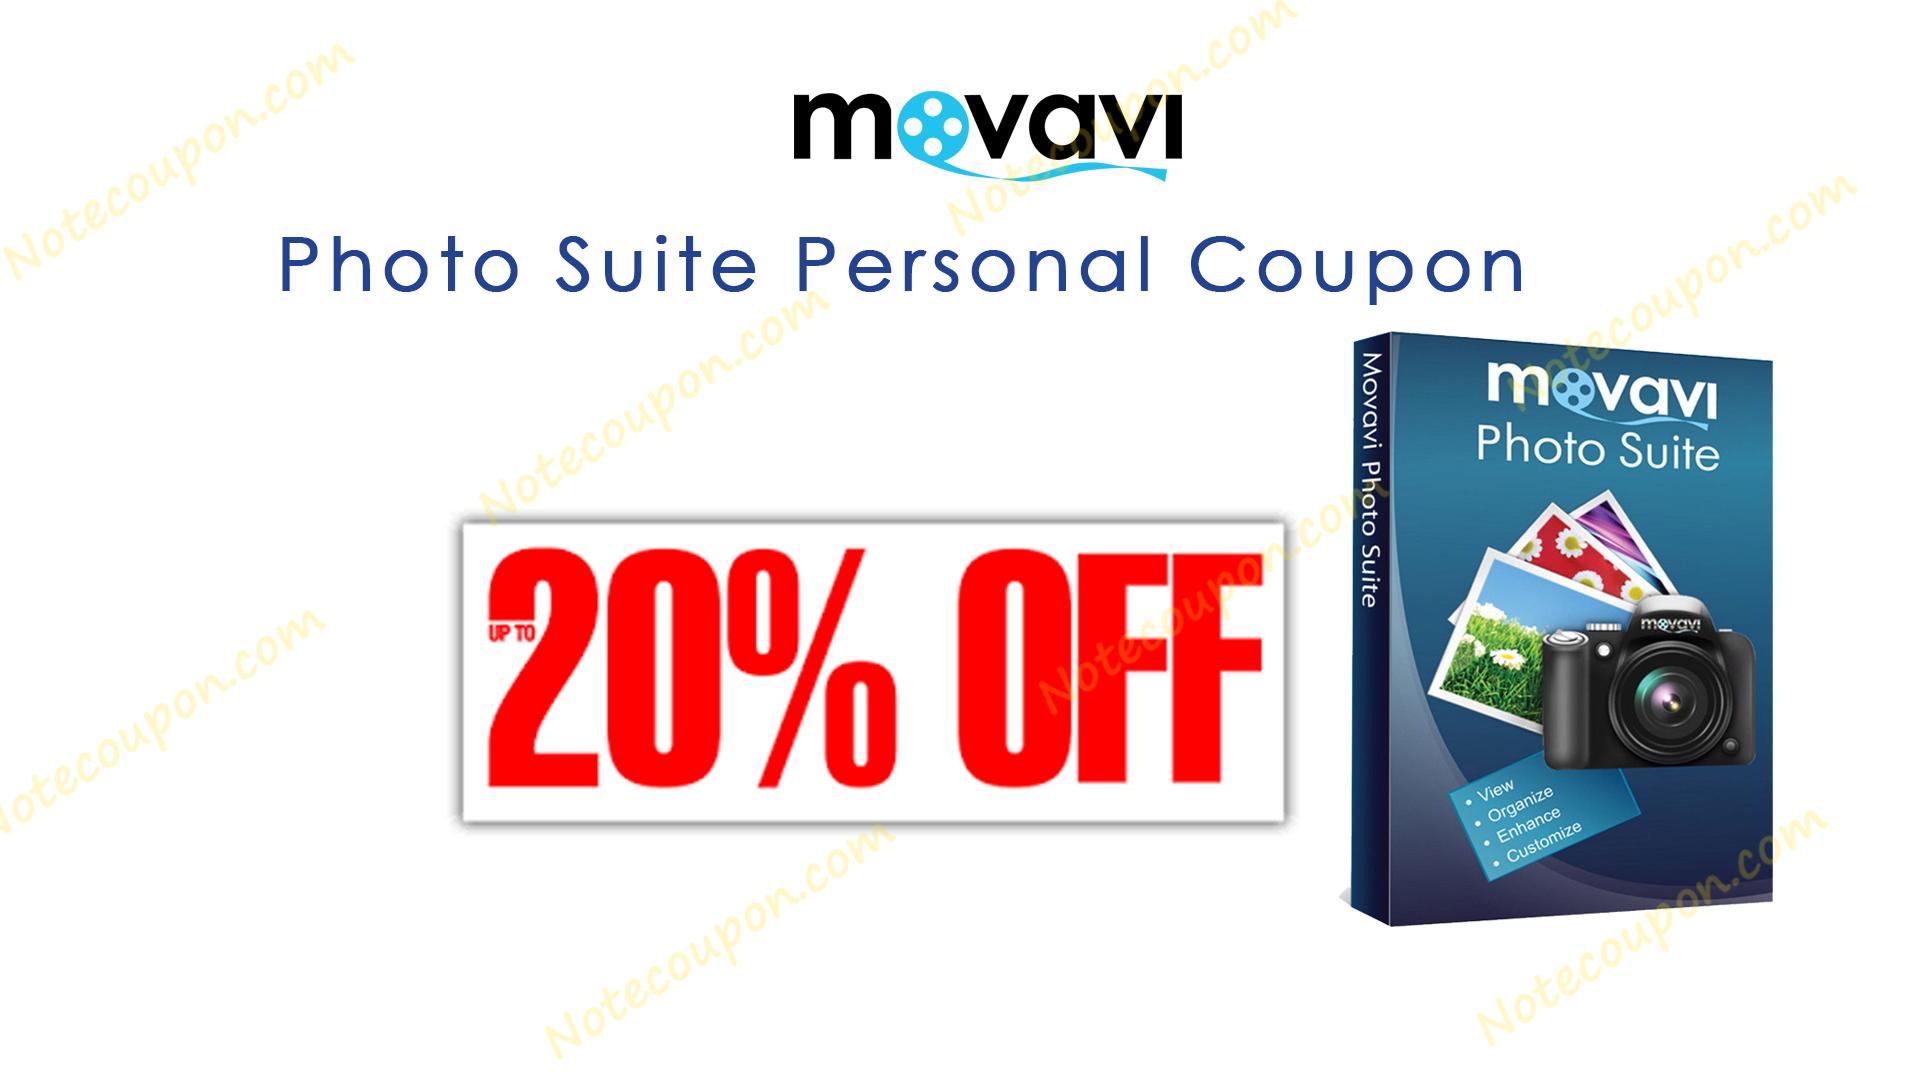 movavi software coupon code